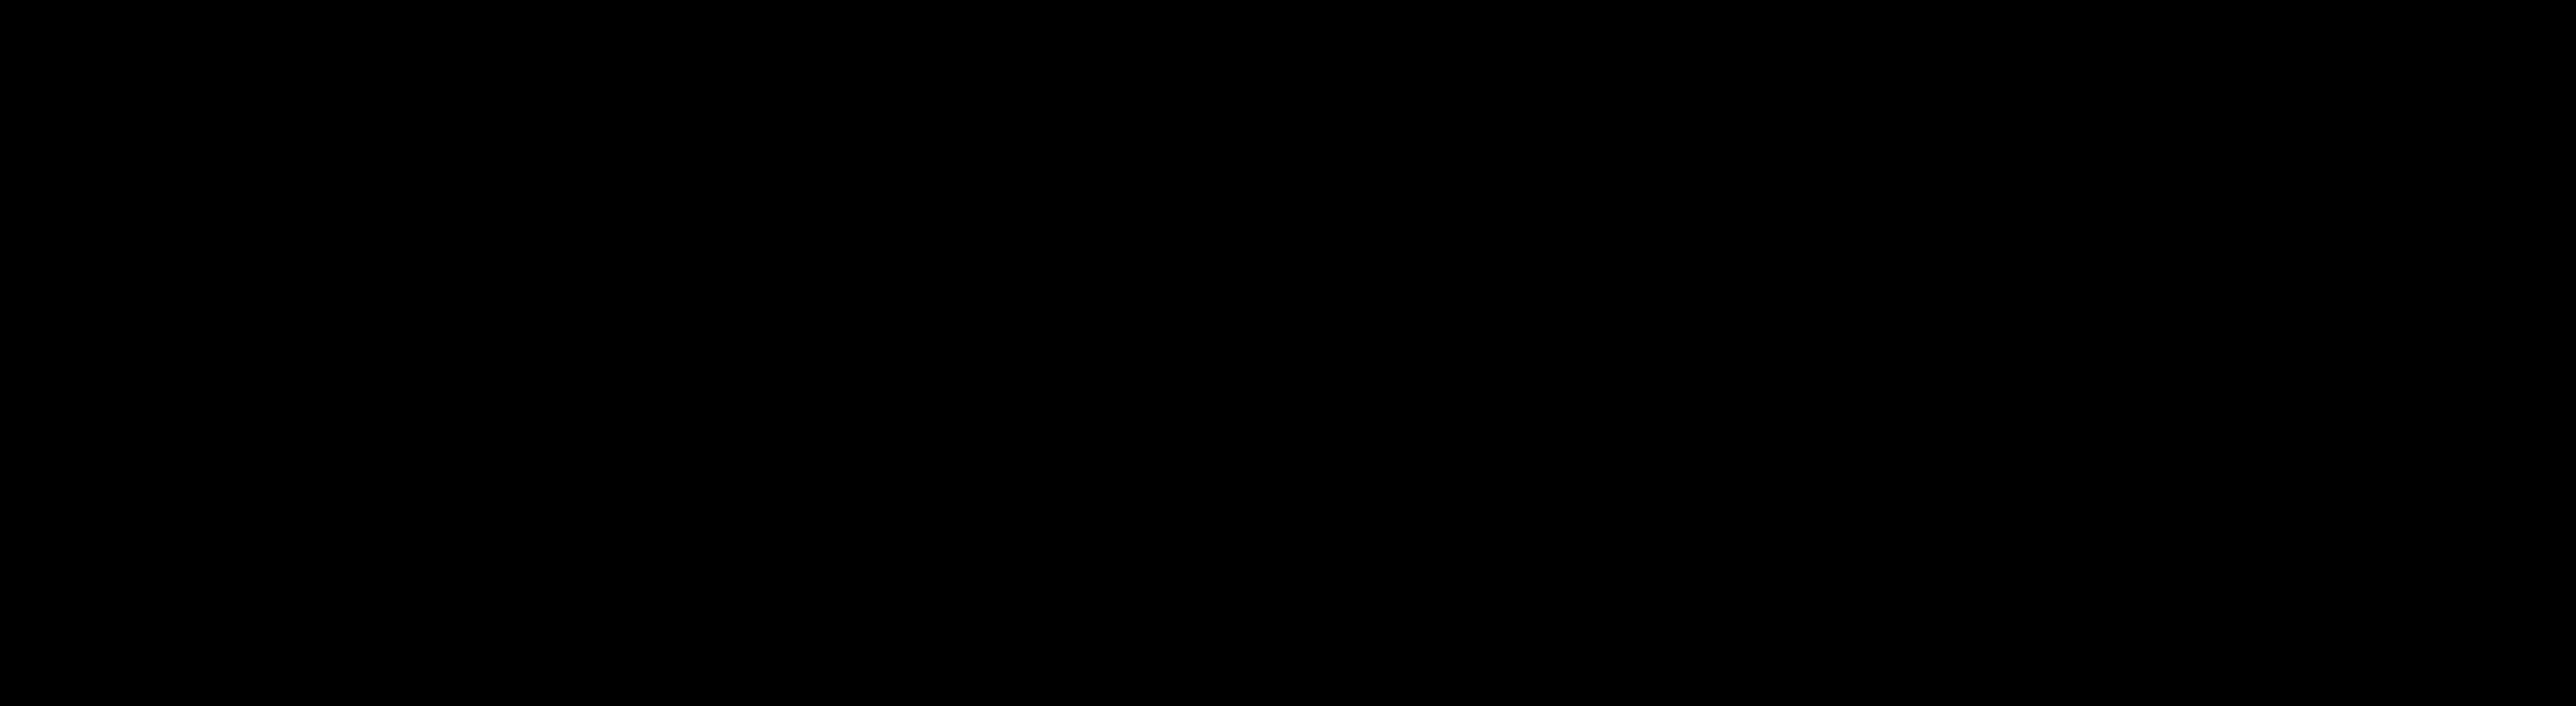 Napster Logo.